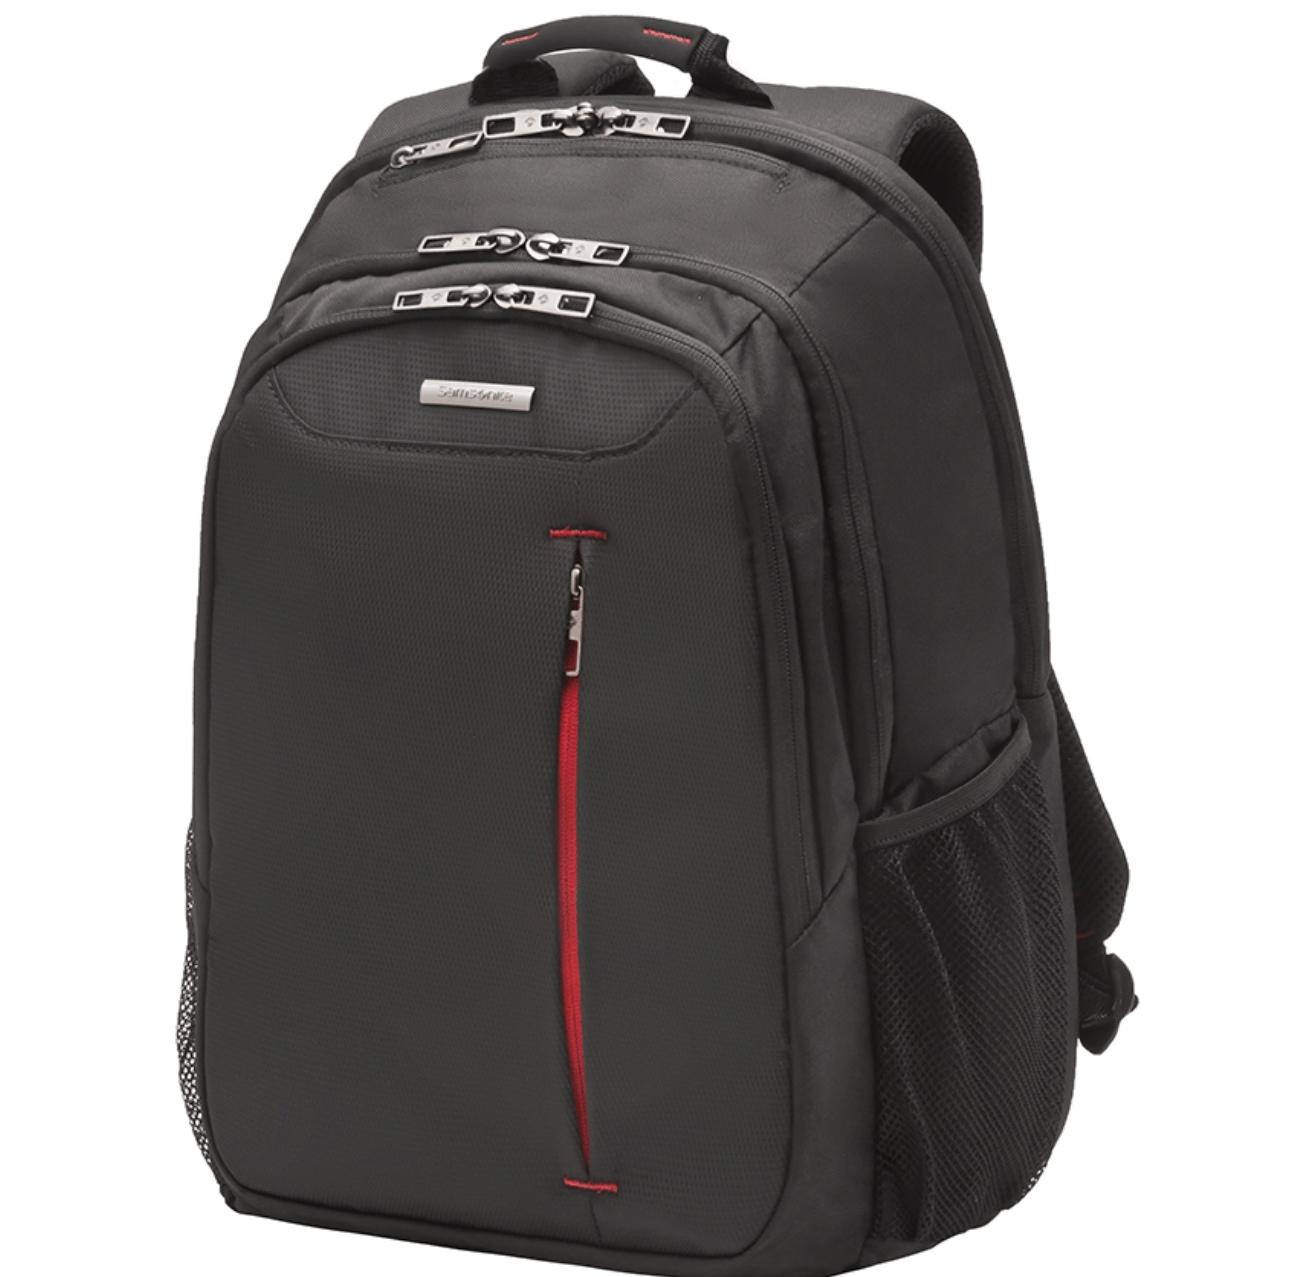 Samsonite Guard-IT Laptop Backpack 15.6 inch £19.99 with code + 2 Year Guarantee @ Robert Dyas (free c+c)